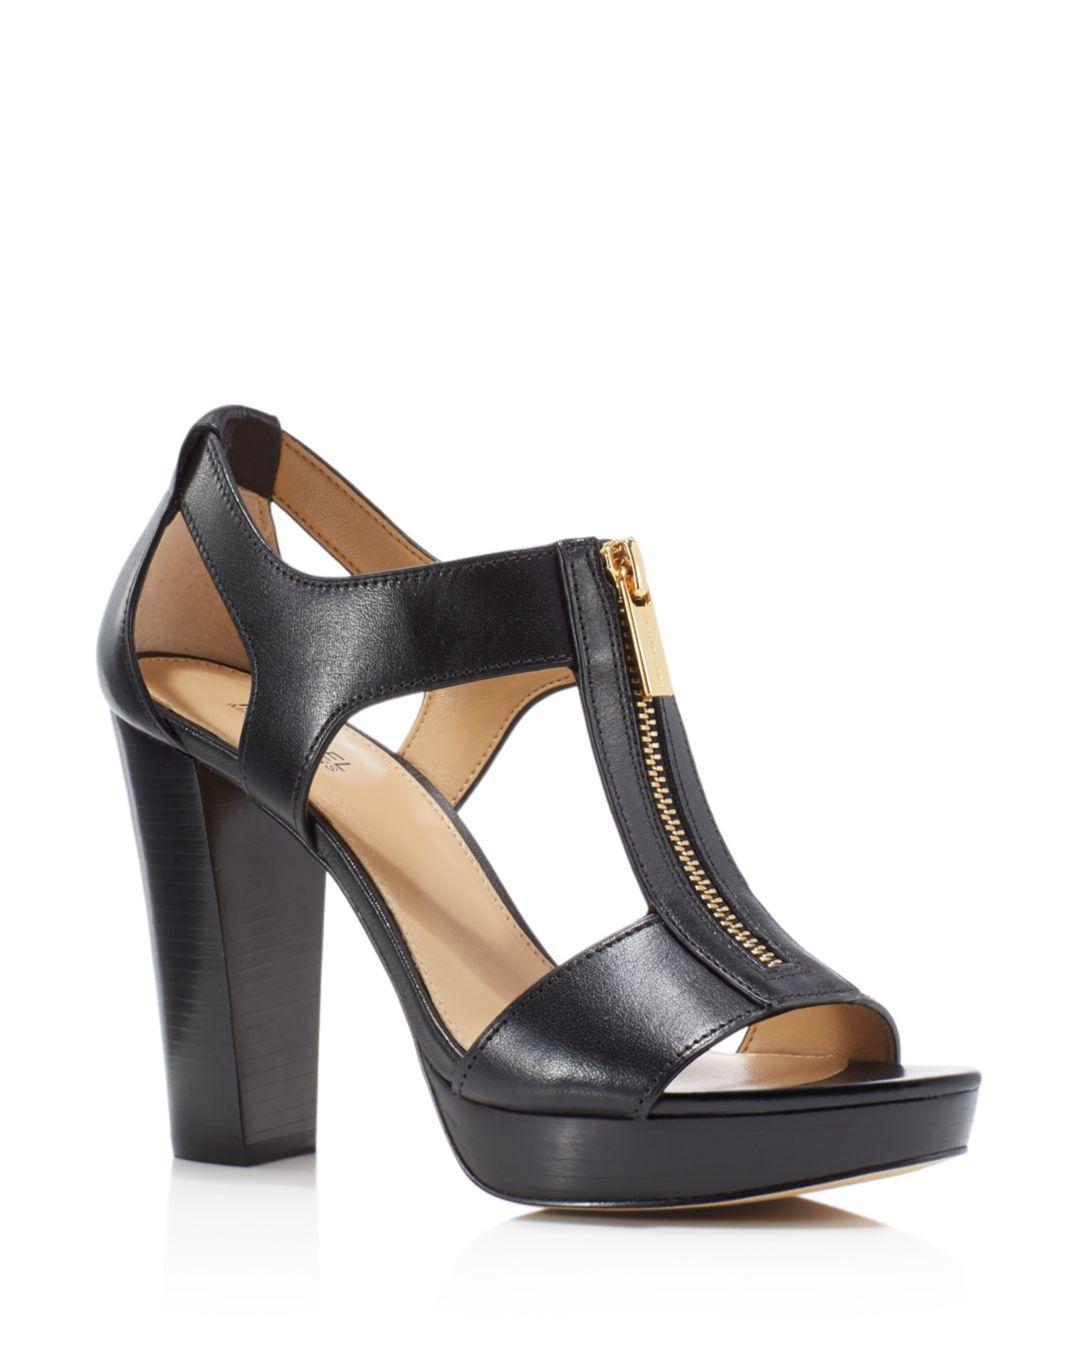 Lyst - Michael Kors Berkley T-strap Platform Dress Sandals